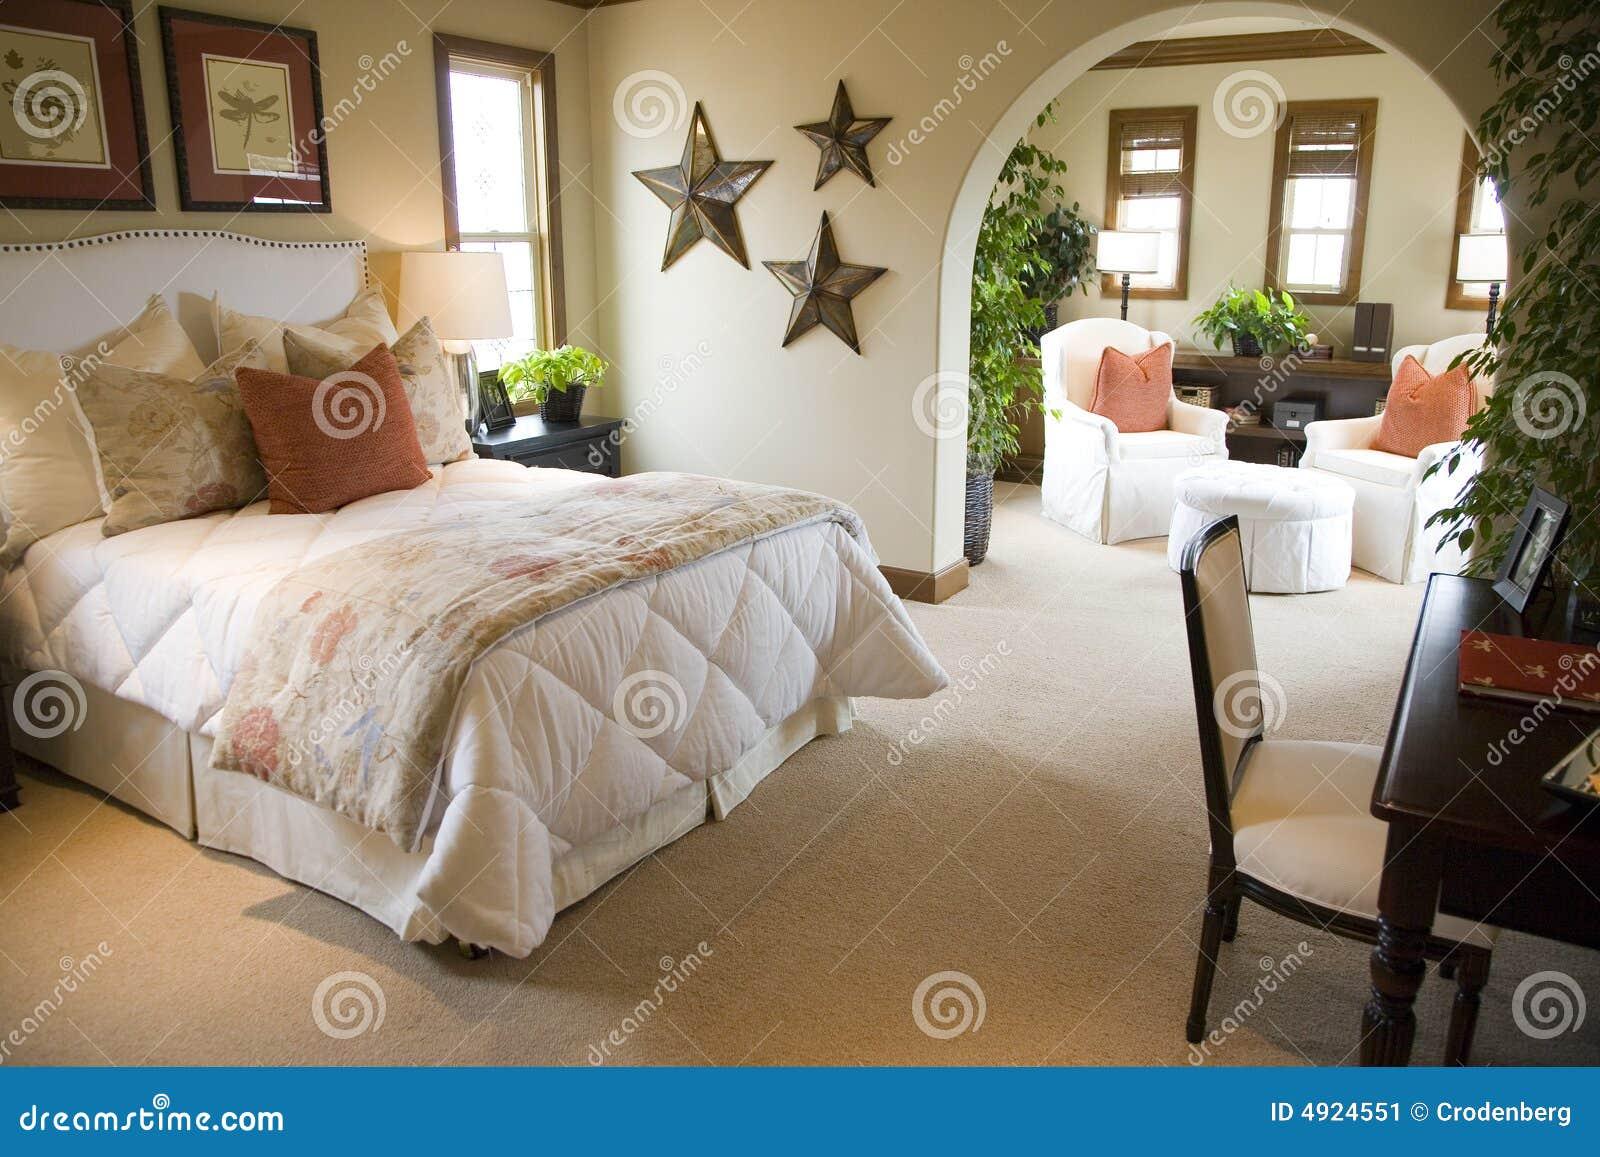 Luxury home bedroom.